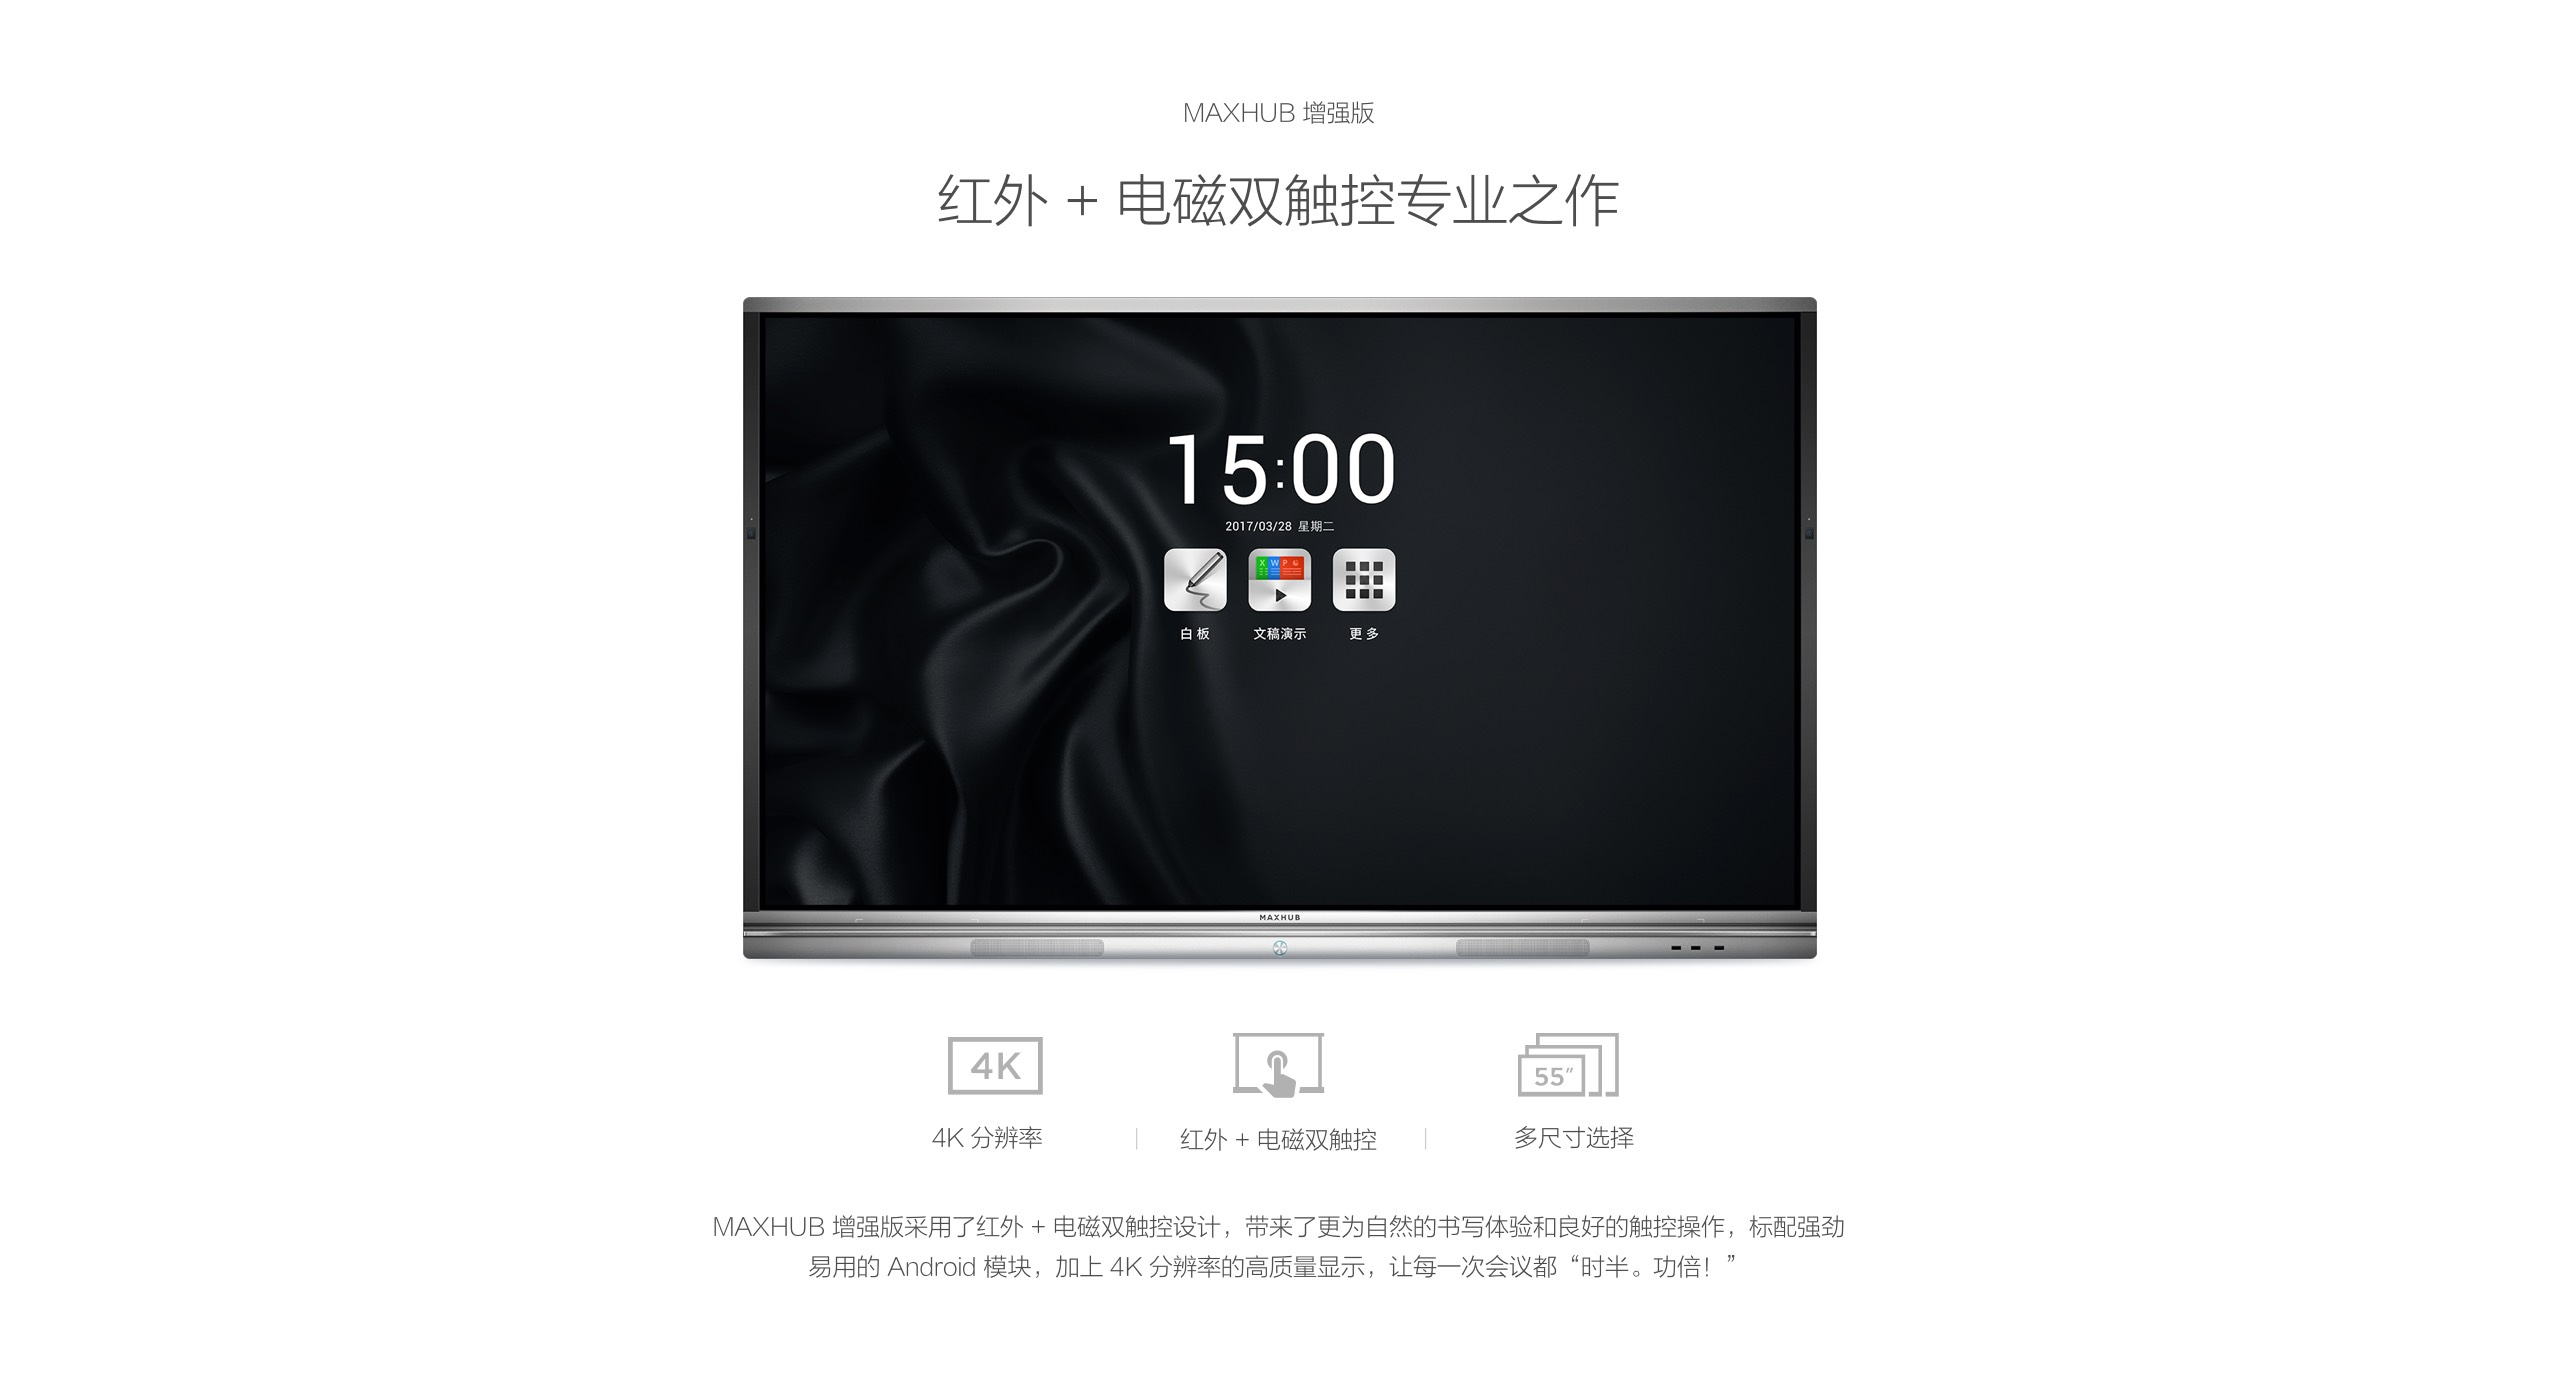 MAXHUB Premium 55